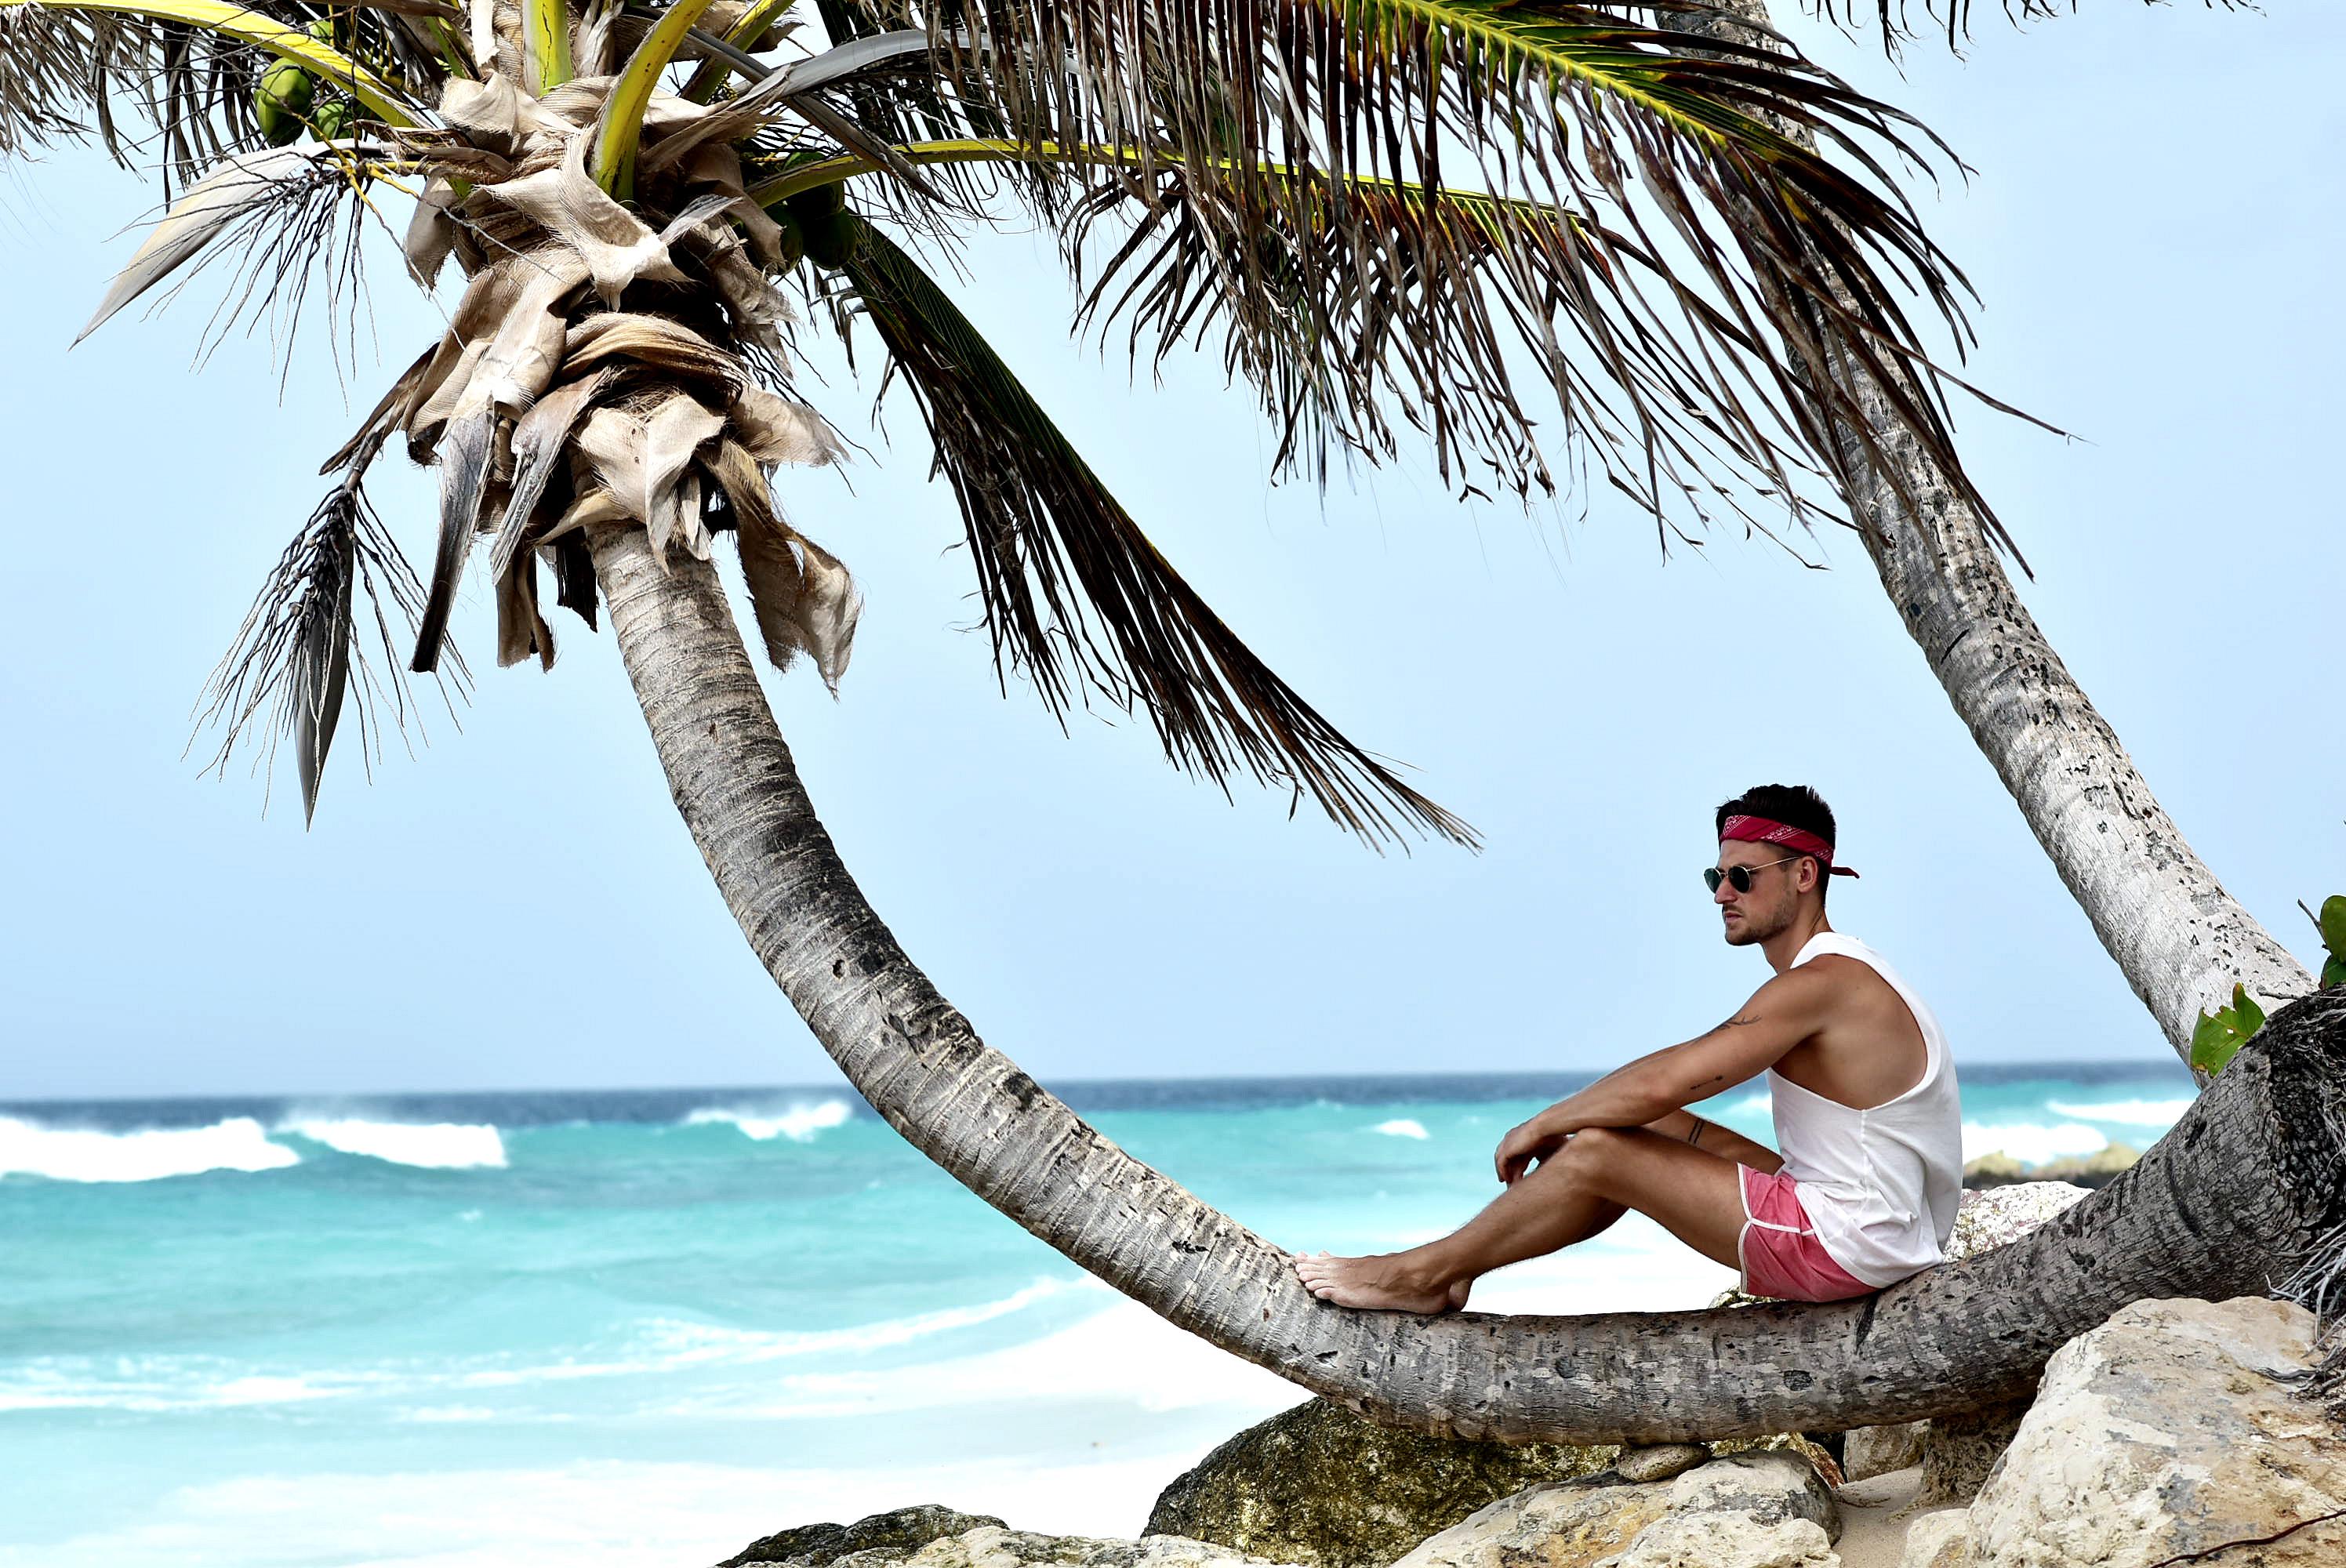 Tommeezjerry-Männerblog-Berlinblog-Fashionblog-Styleblog-Travelblog-Travel-Reiseblog-Reisen-Barbados-Karibik-Carribean-Summer-Sommer-Vacation-1